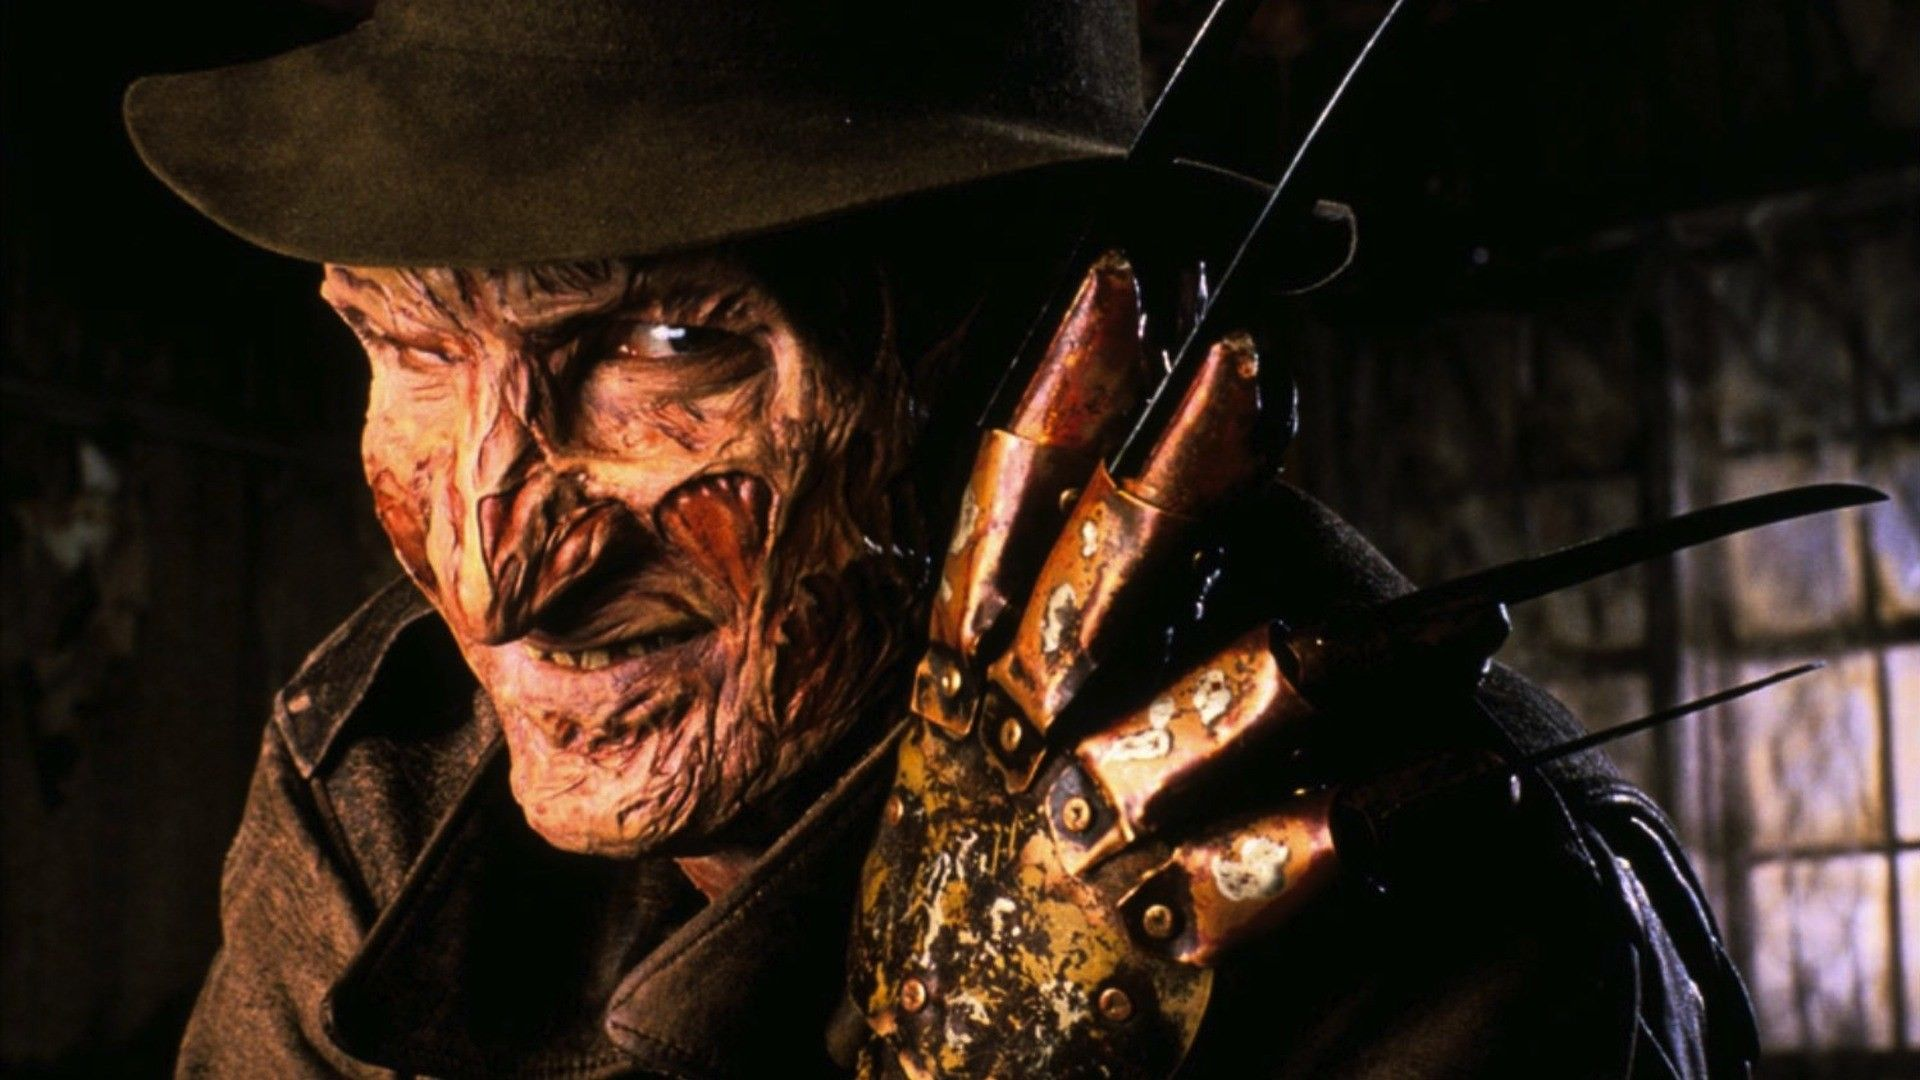 Freddy Krueger Wallpapers - Top Free Freddy Krueger ...